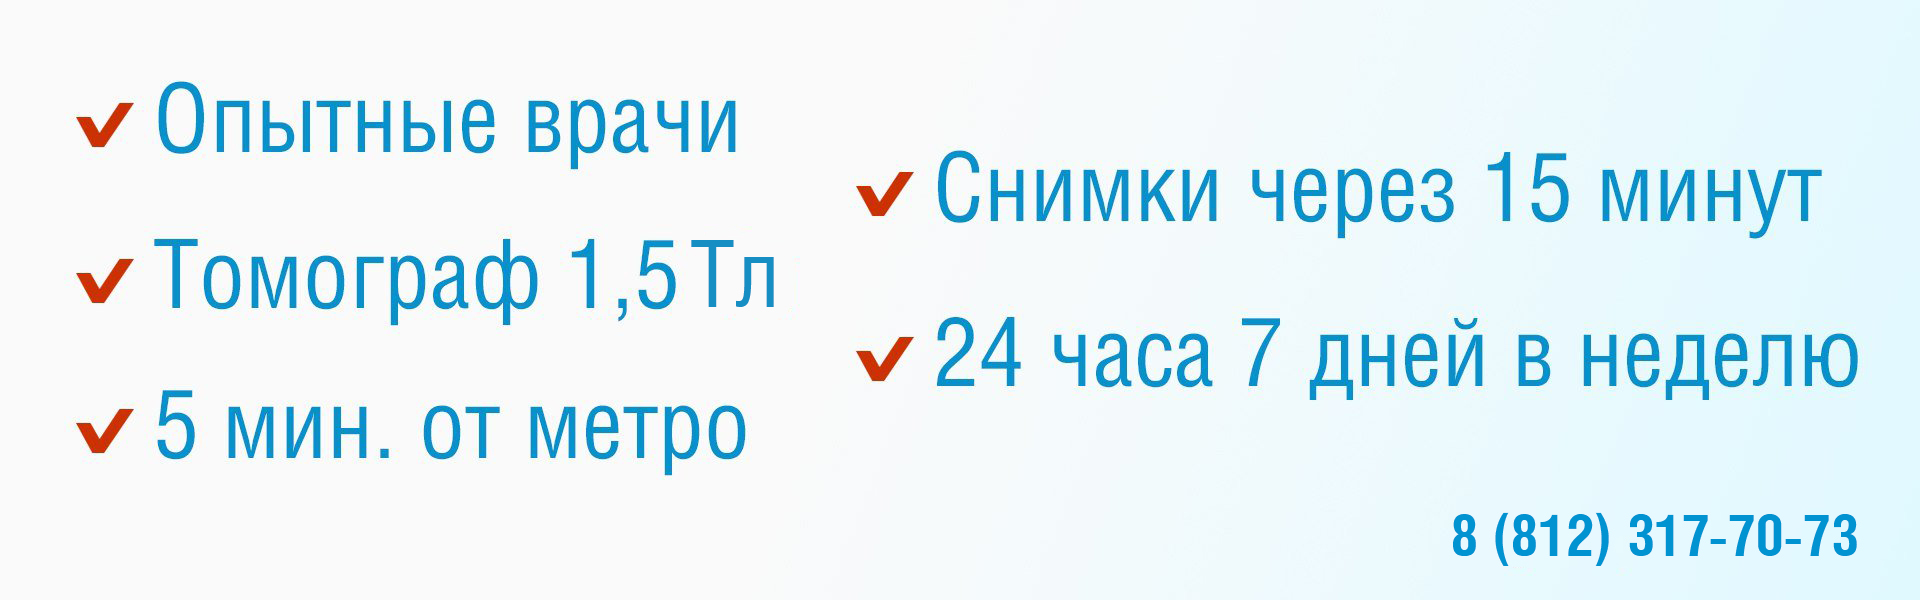 tzD8lAAINIg